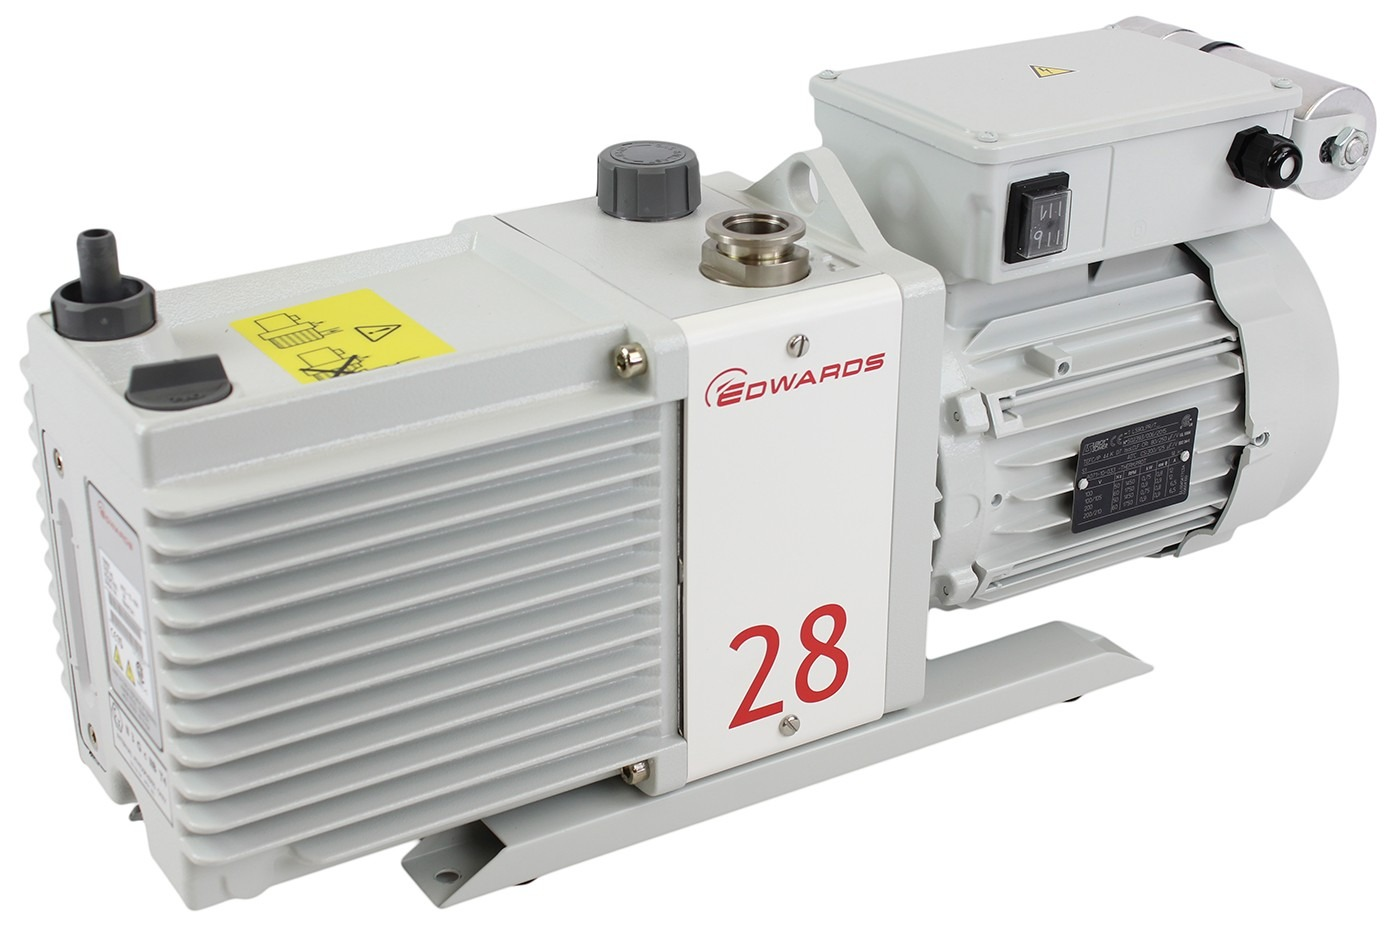 Edwards E2M28 21 CFM Dual-Stage High Capacity Vacuum Pump